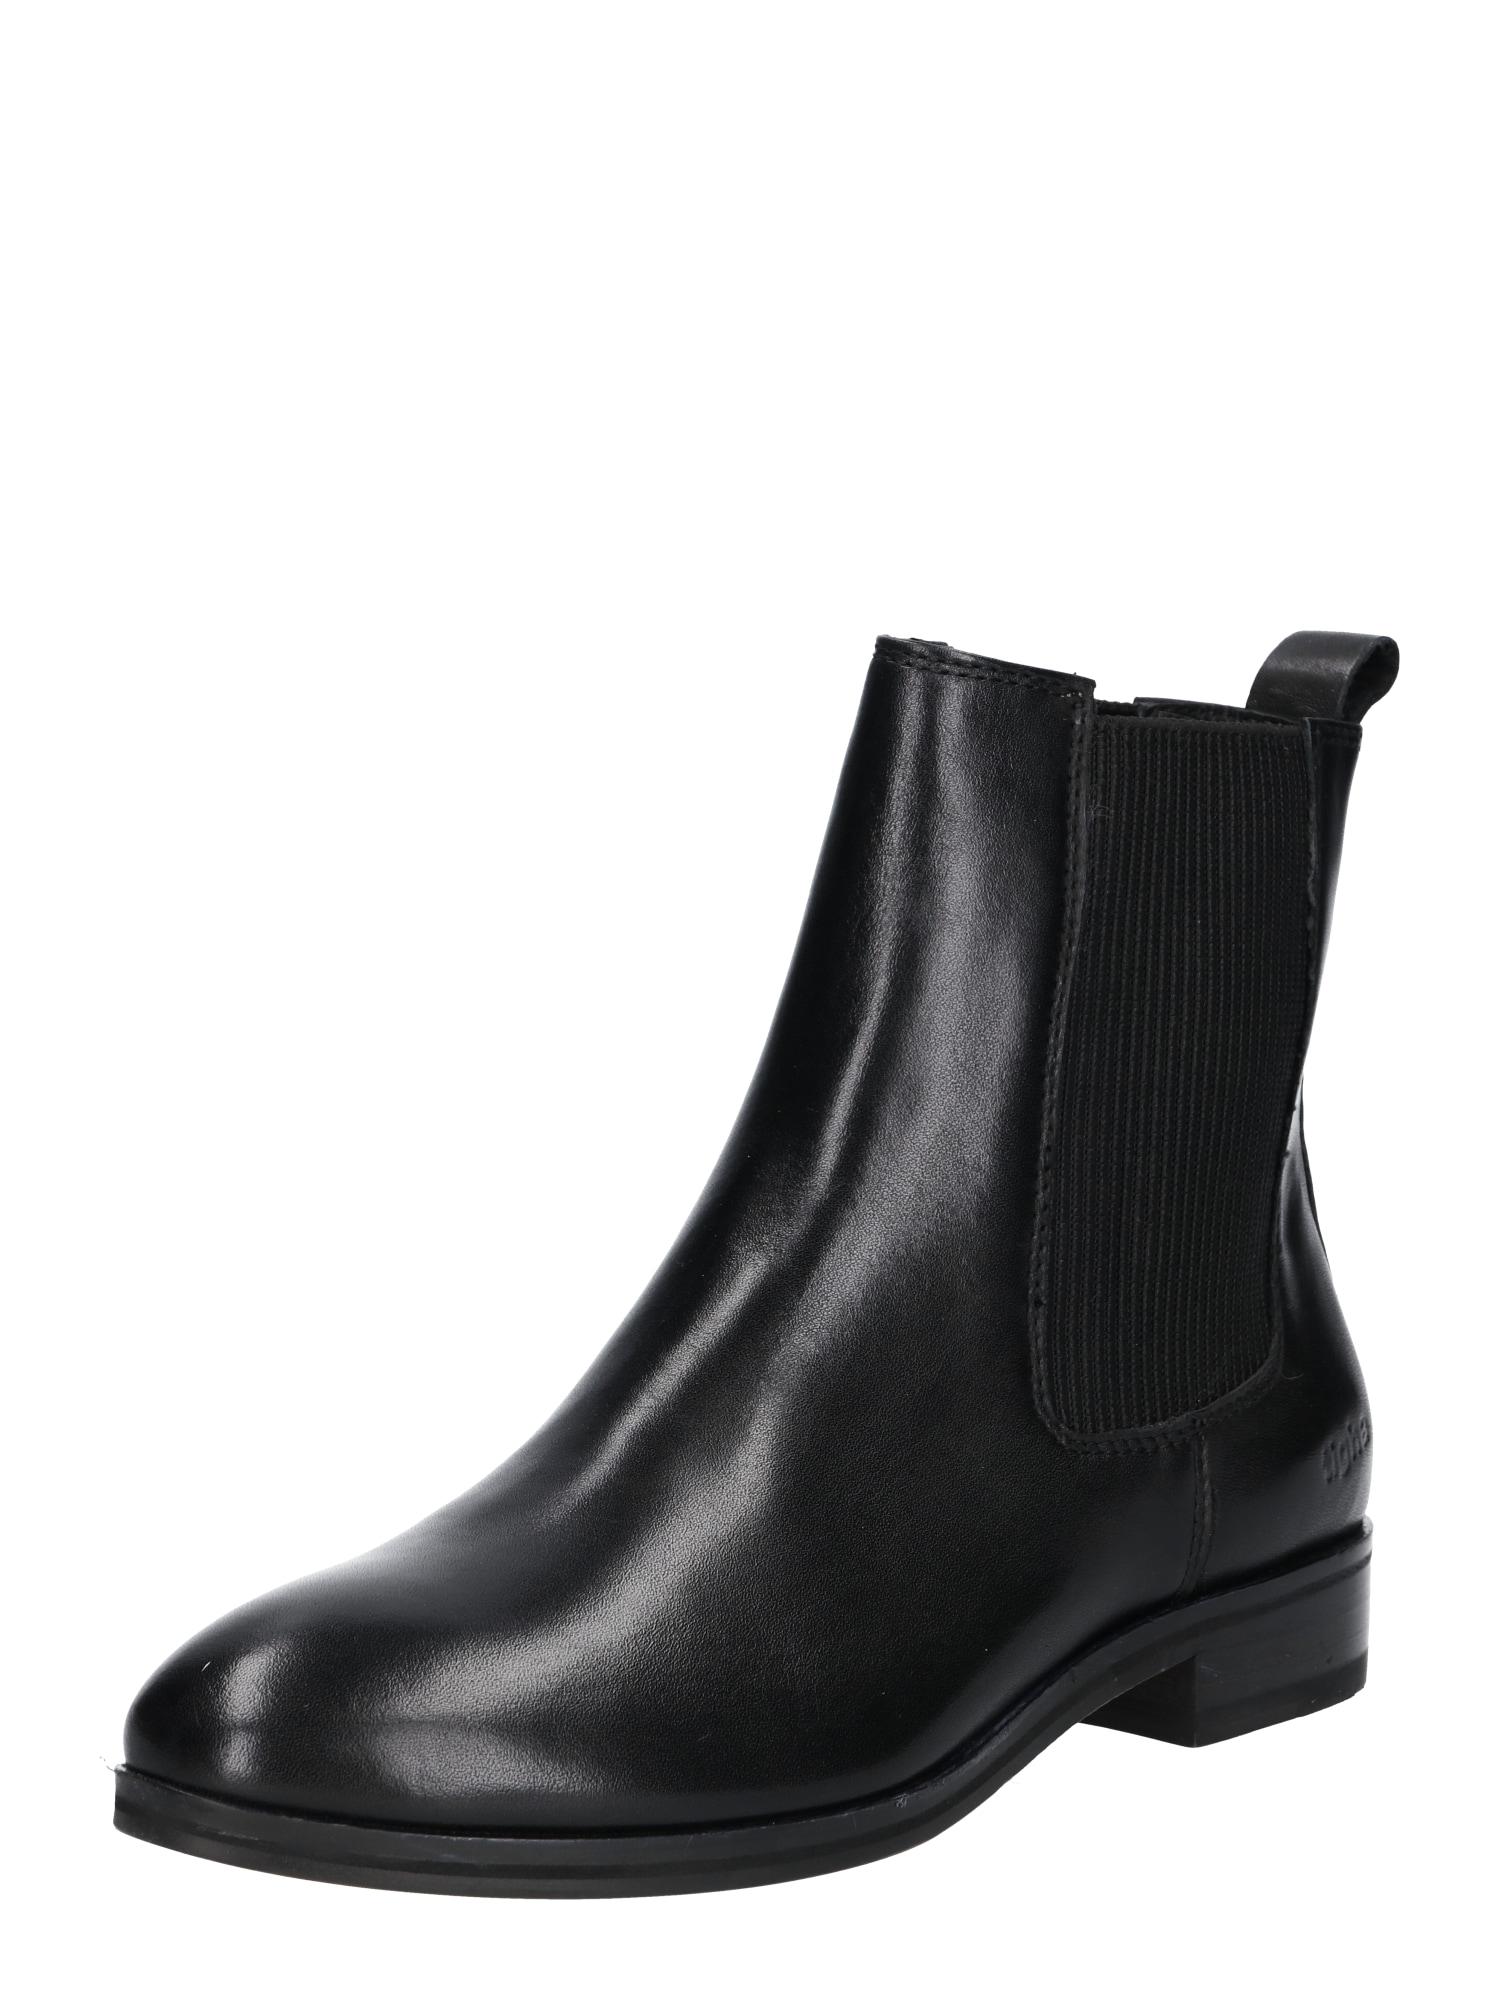 Chelsea boty Anine 500 černá Tigha